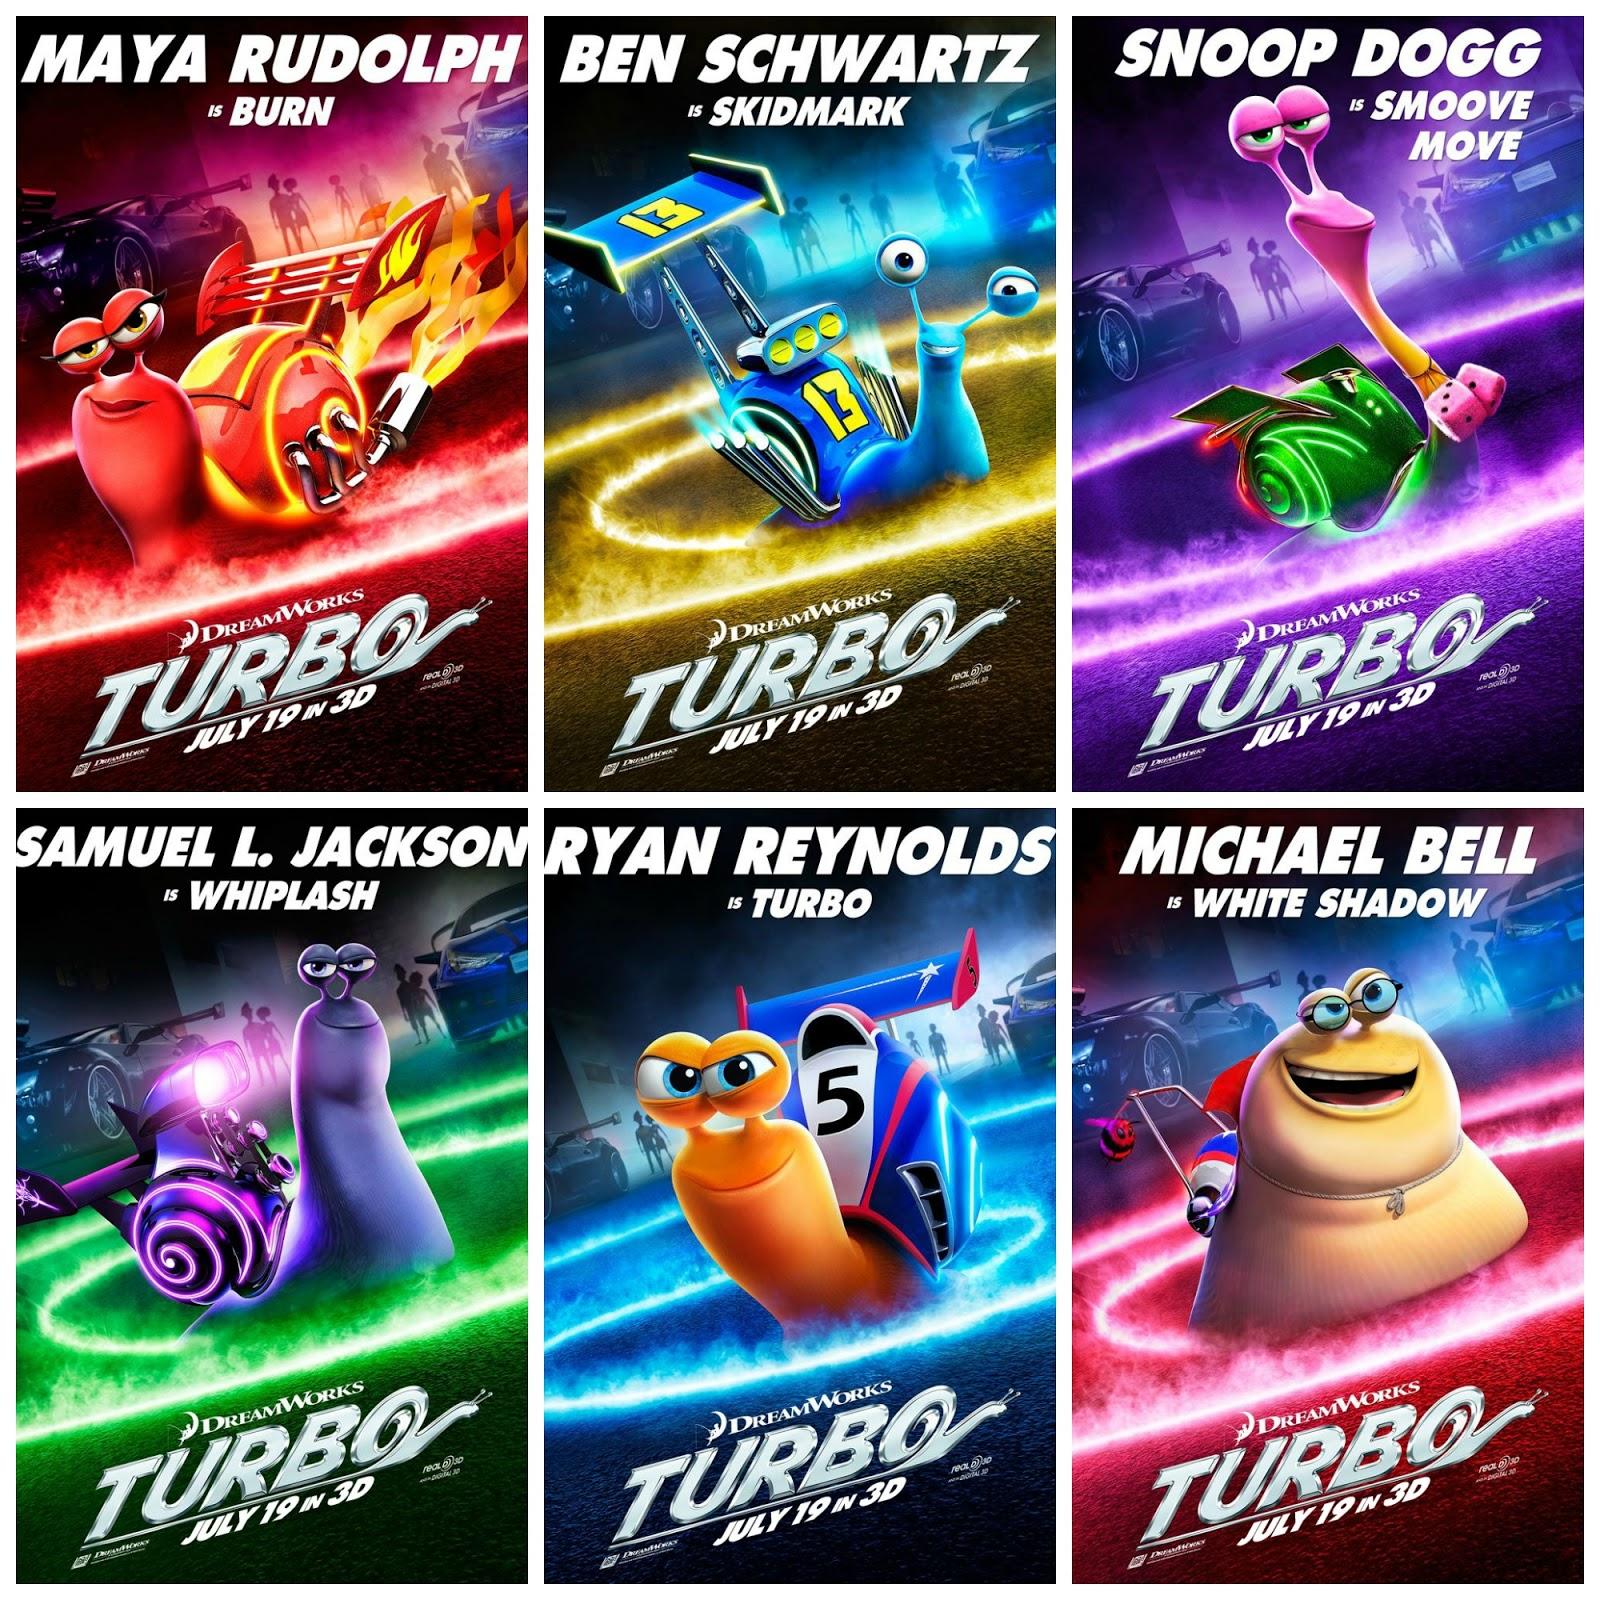 turbo meet the crew lyrics